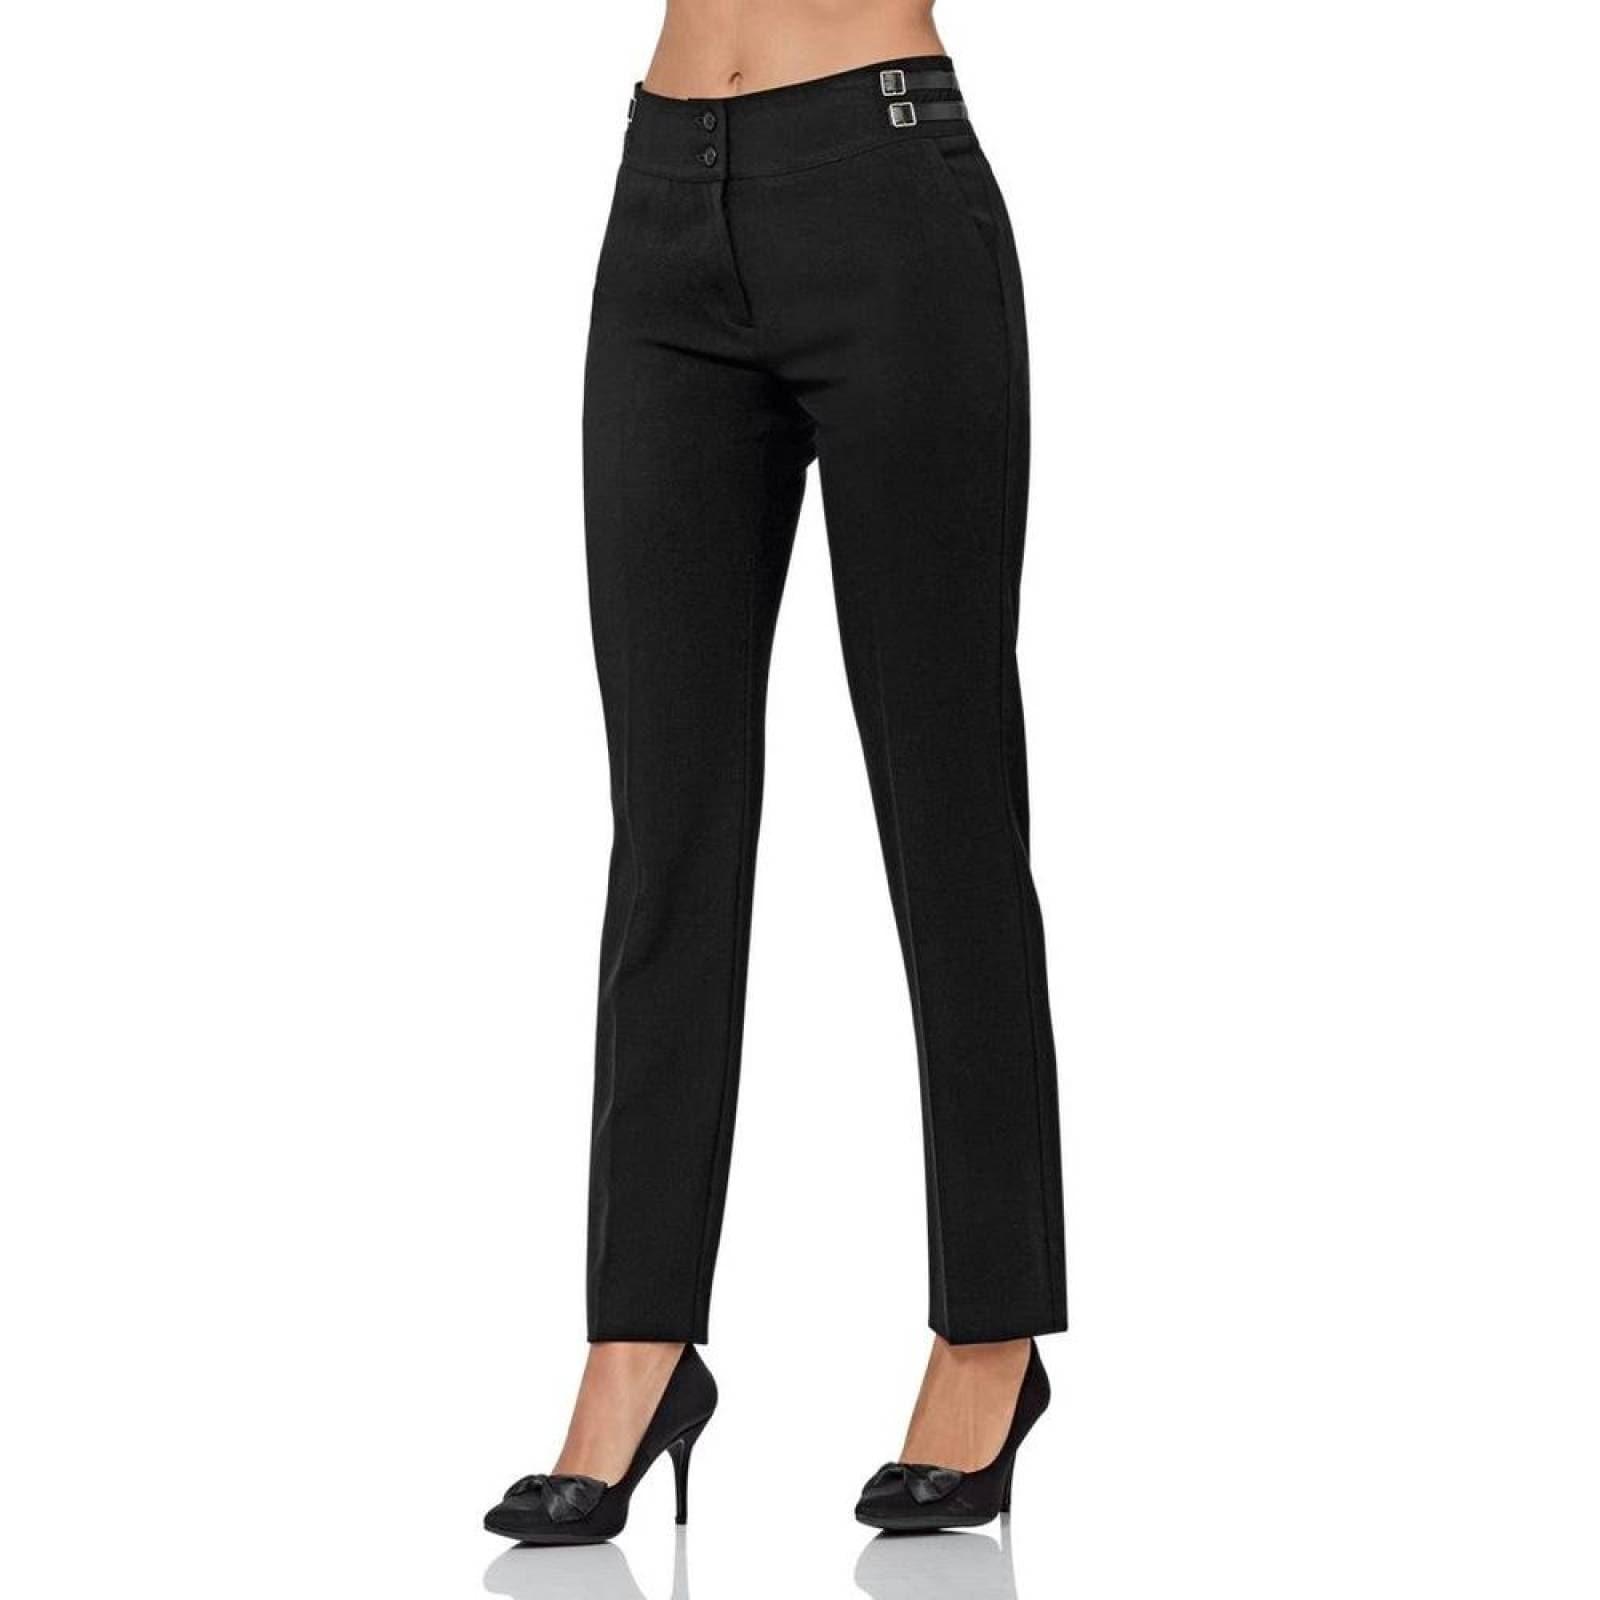 Pantalon De Vestir Barbary Mujer Negro Spandex D 1144